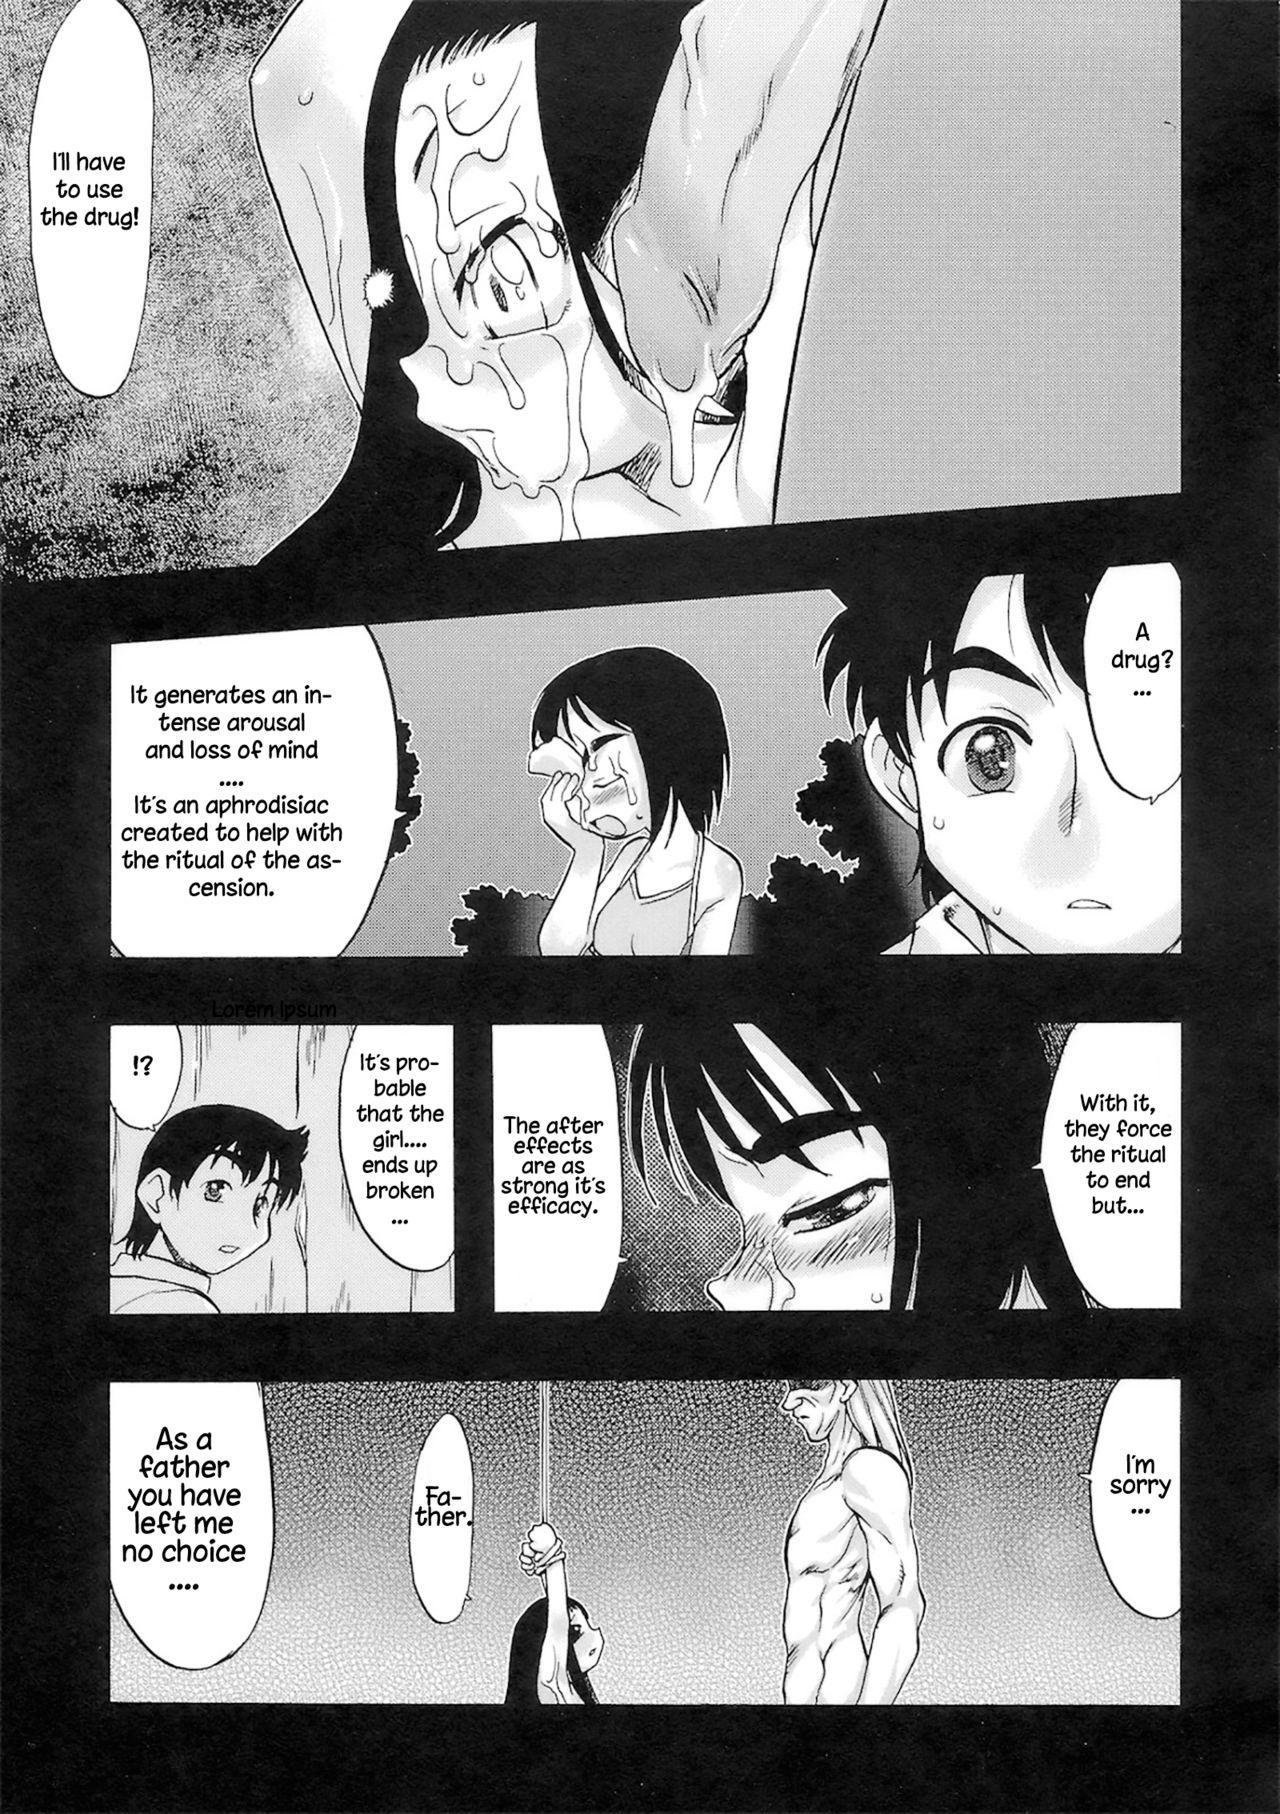 [Teruki Kuma] Osanaki Hana - Kami Haramishi Otome Ch. 1-5.5 [English] [Hige] 32